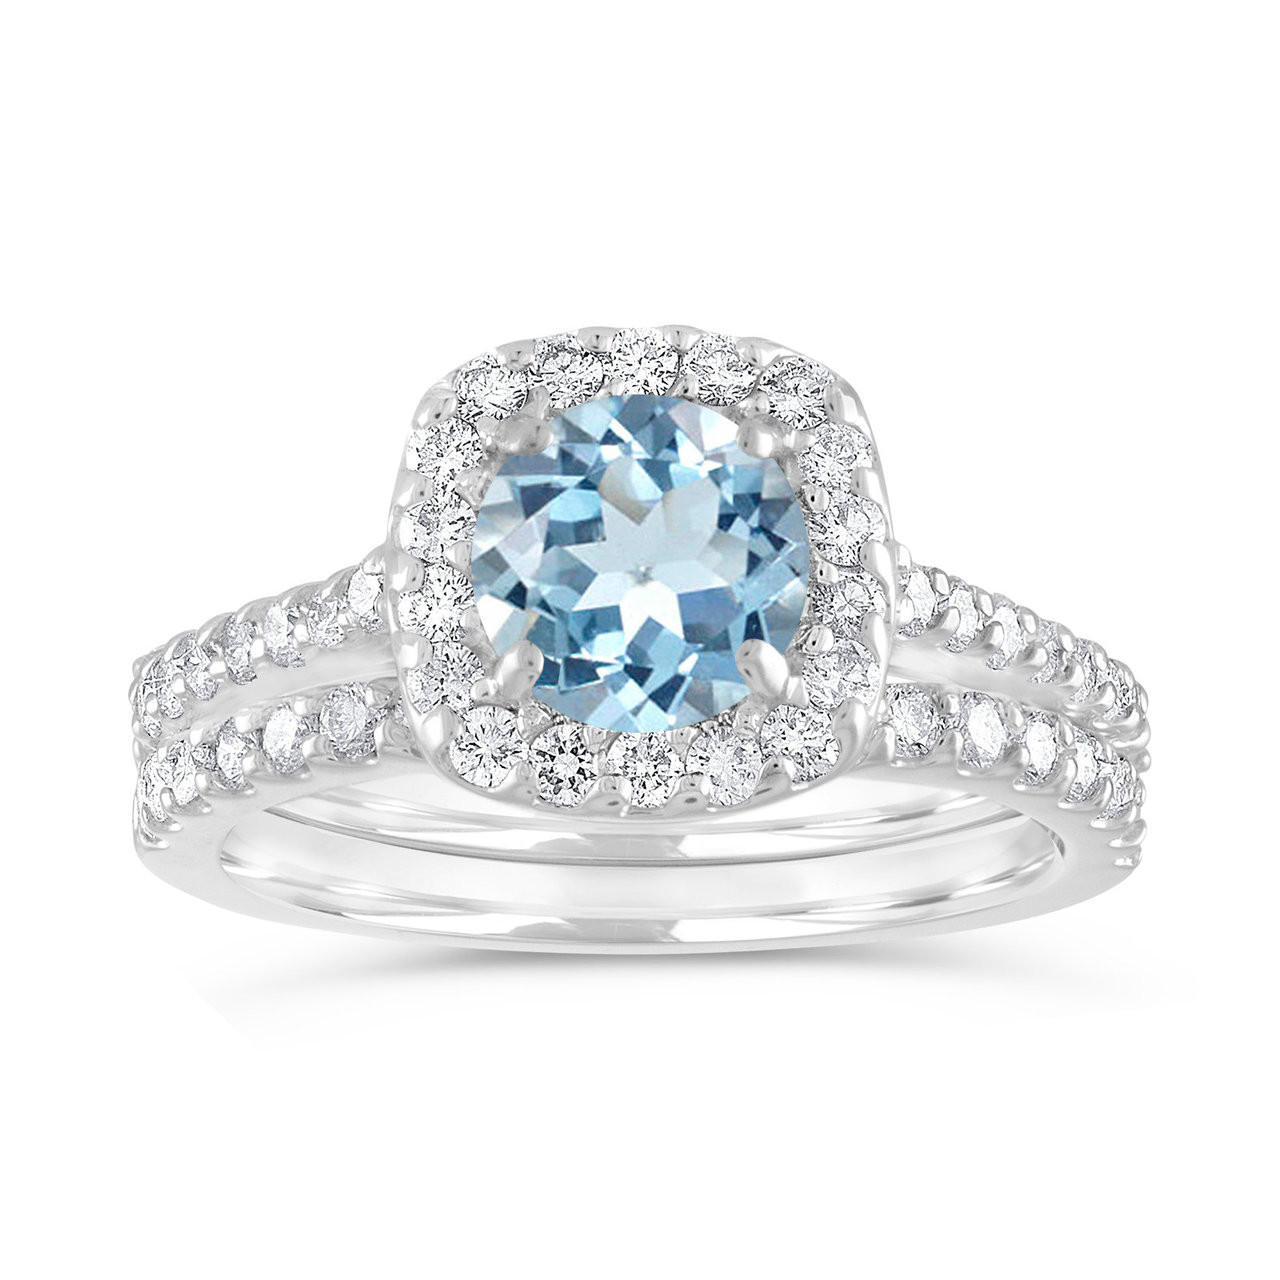 Aquamarine Engagement Ring Set Aquamarine And Diamonds Wedding Ring